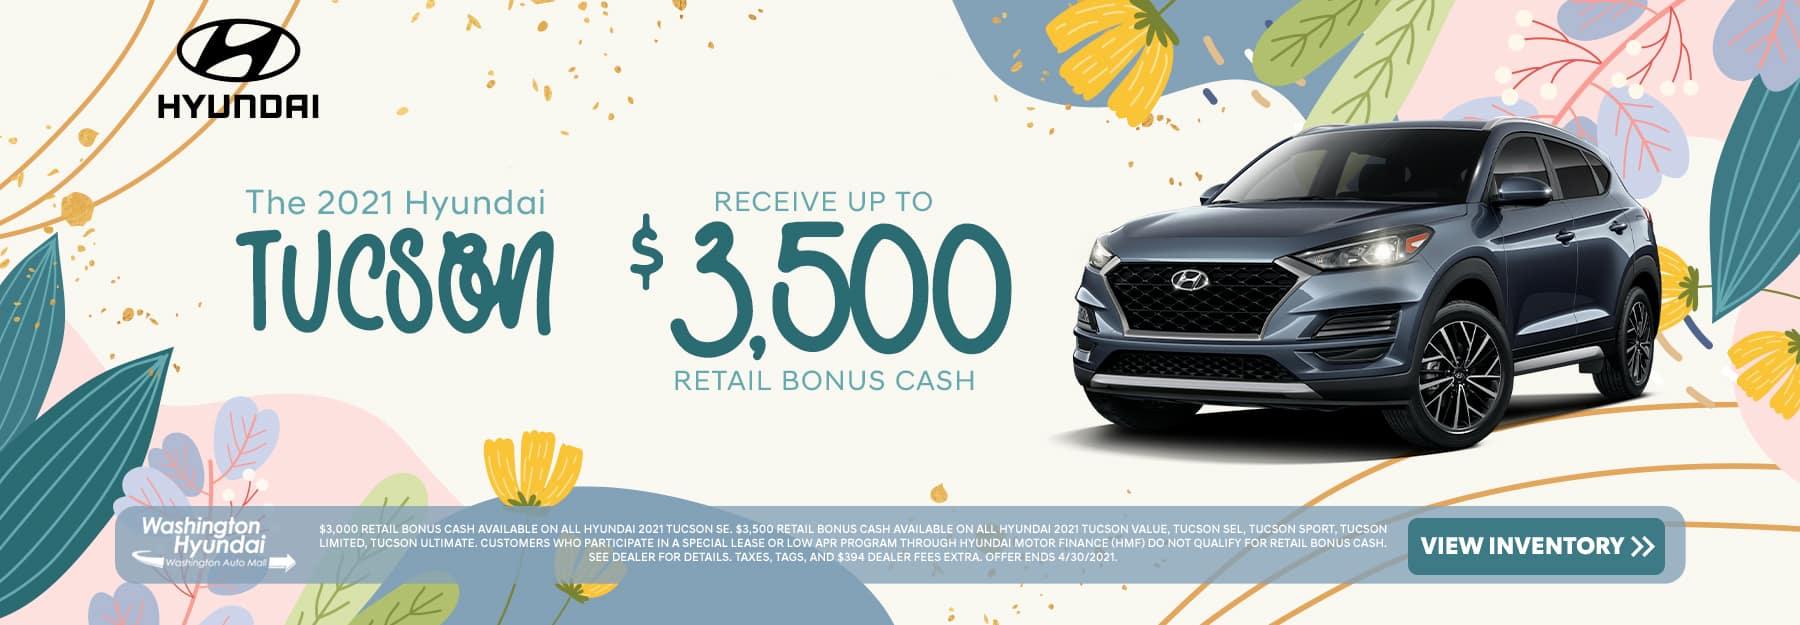 The 2021 Hyundai Tucson - receive up to $3,500 retail bonus cash